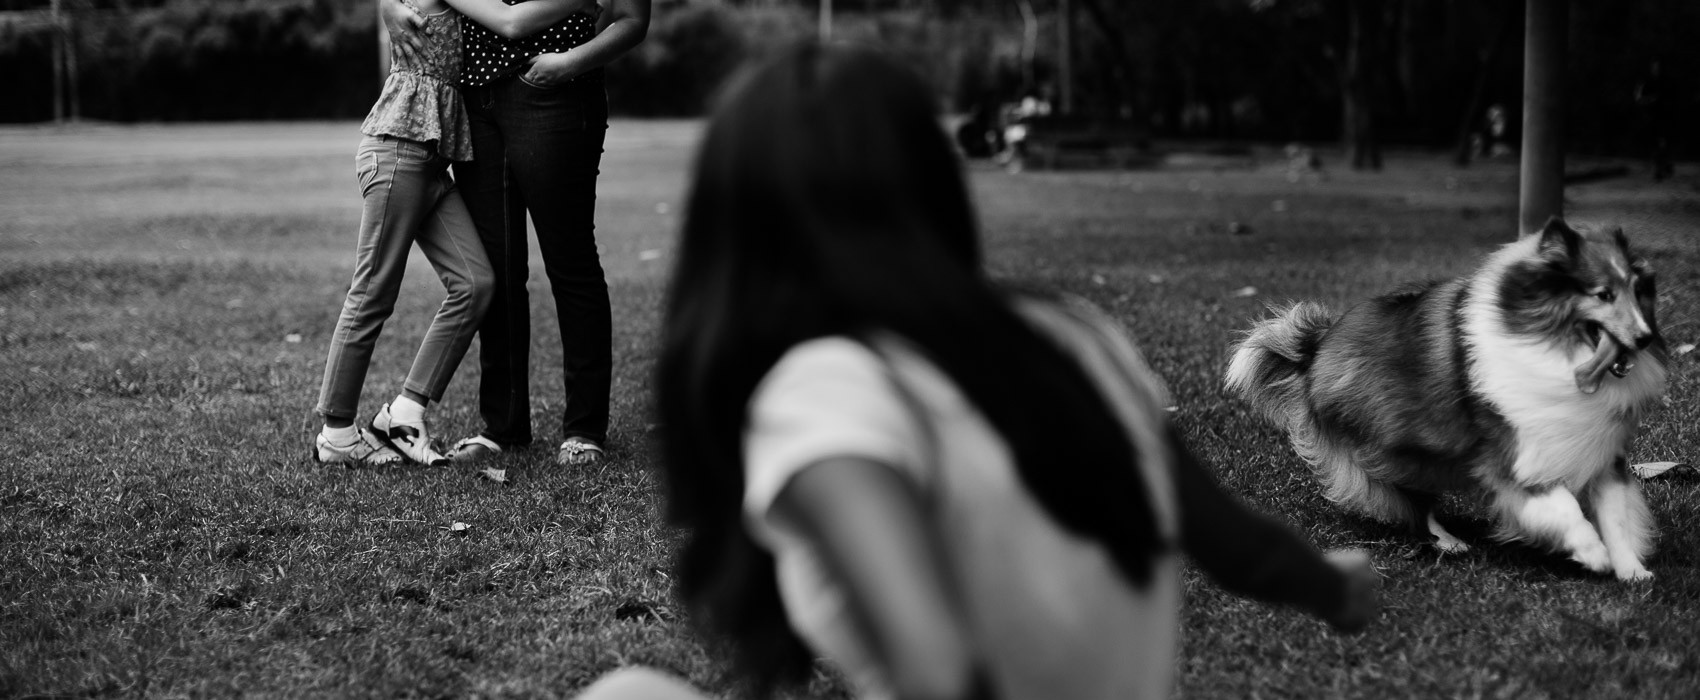 fotografia documental de familia renato dpaula